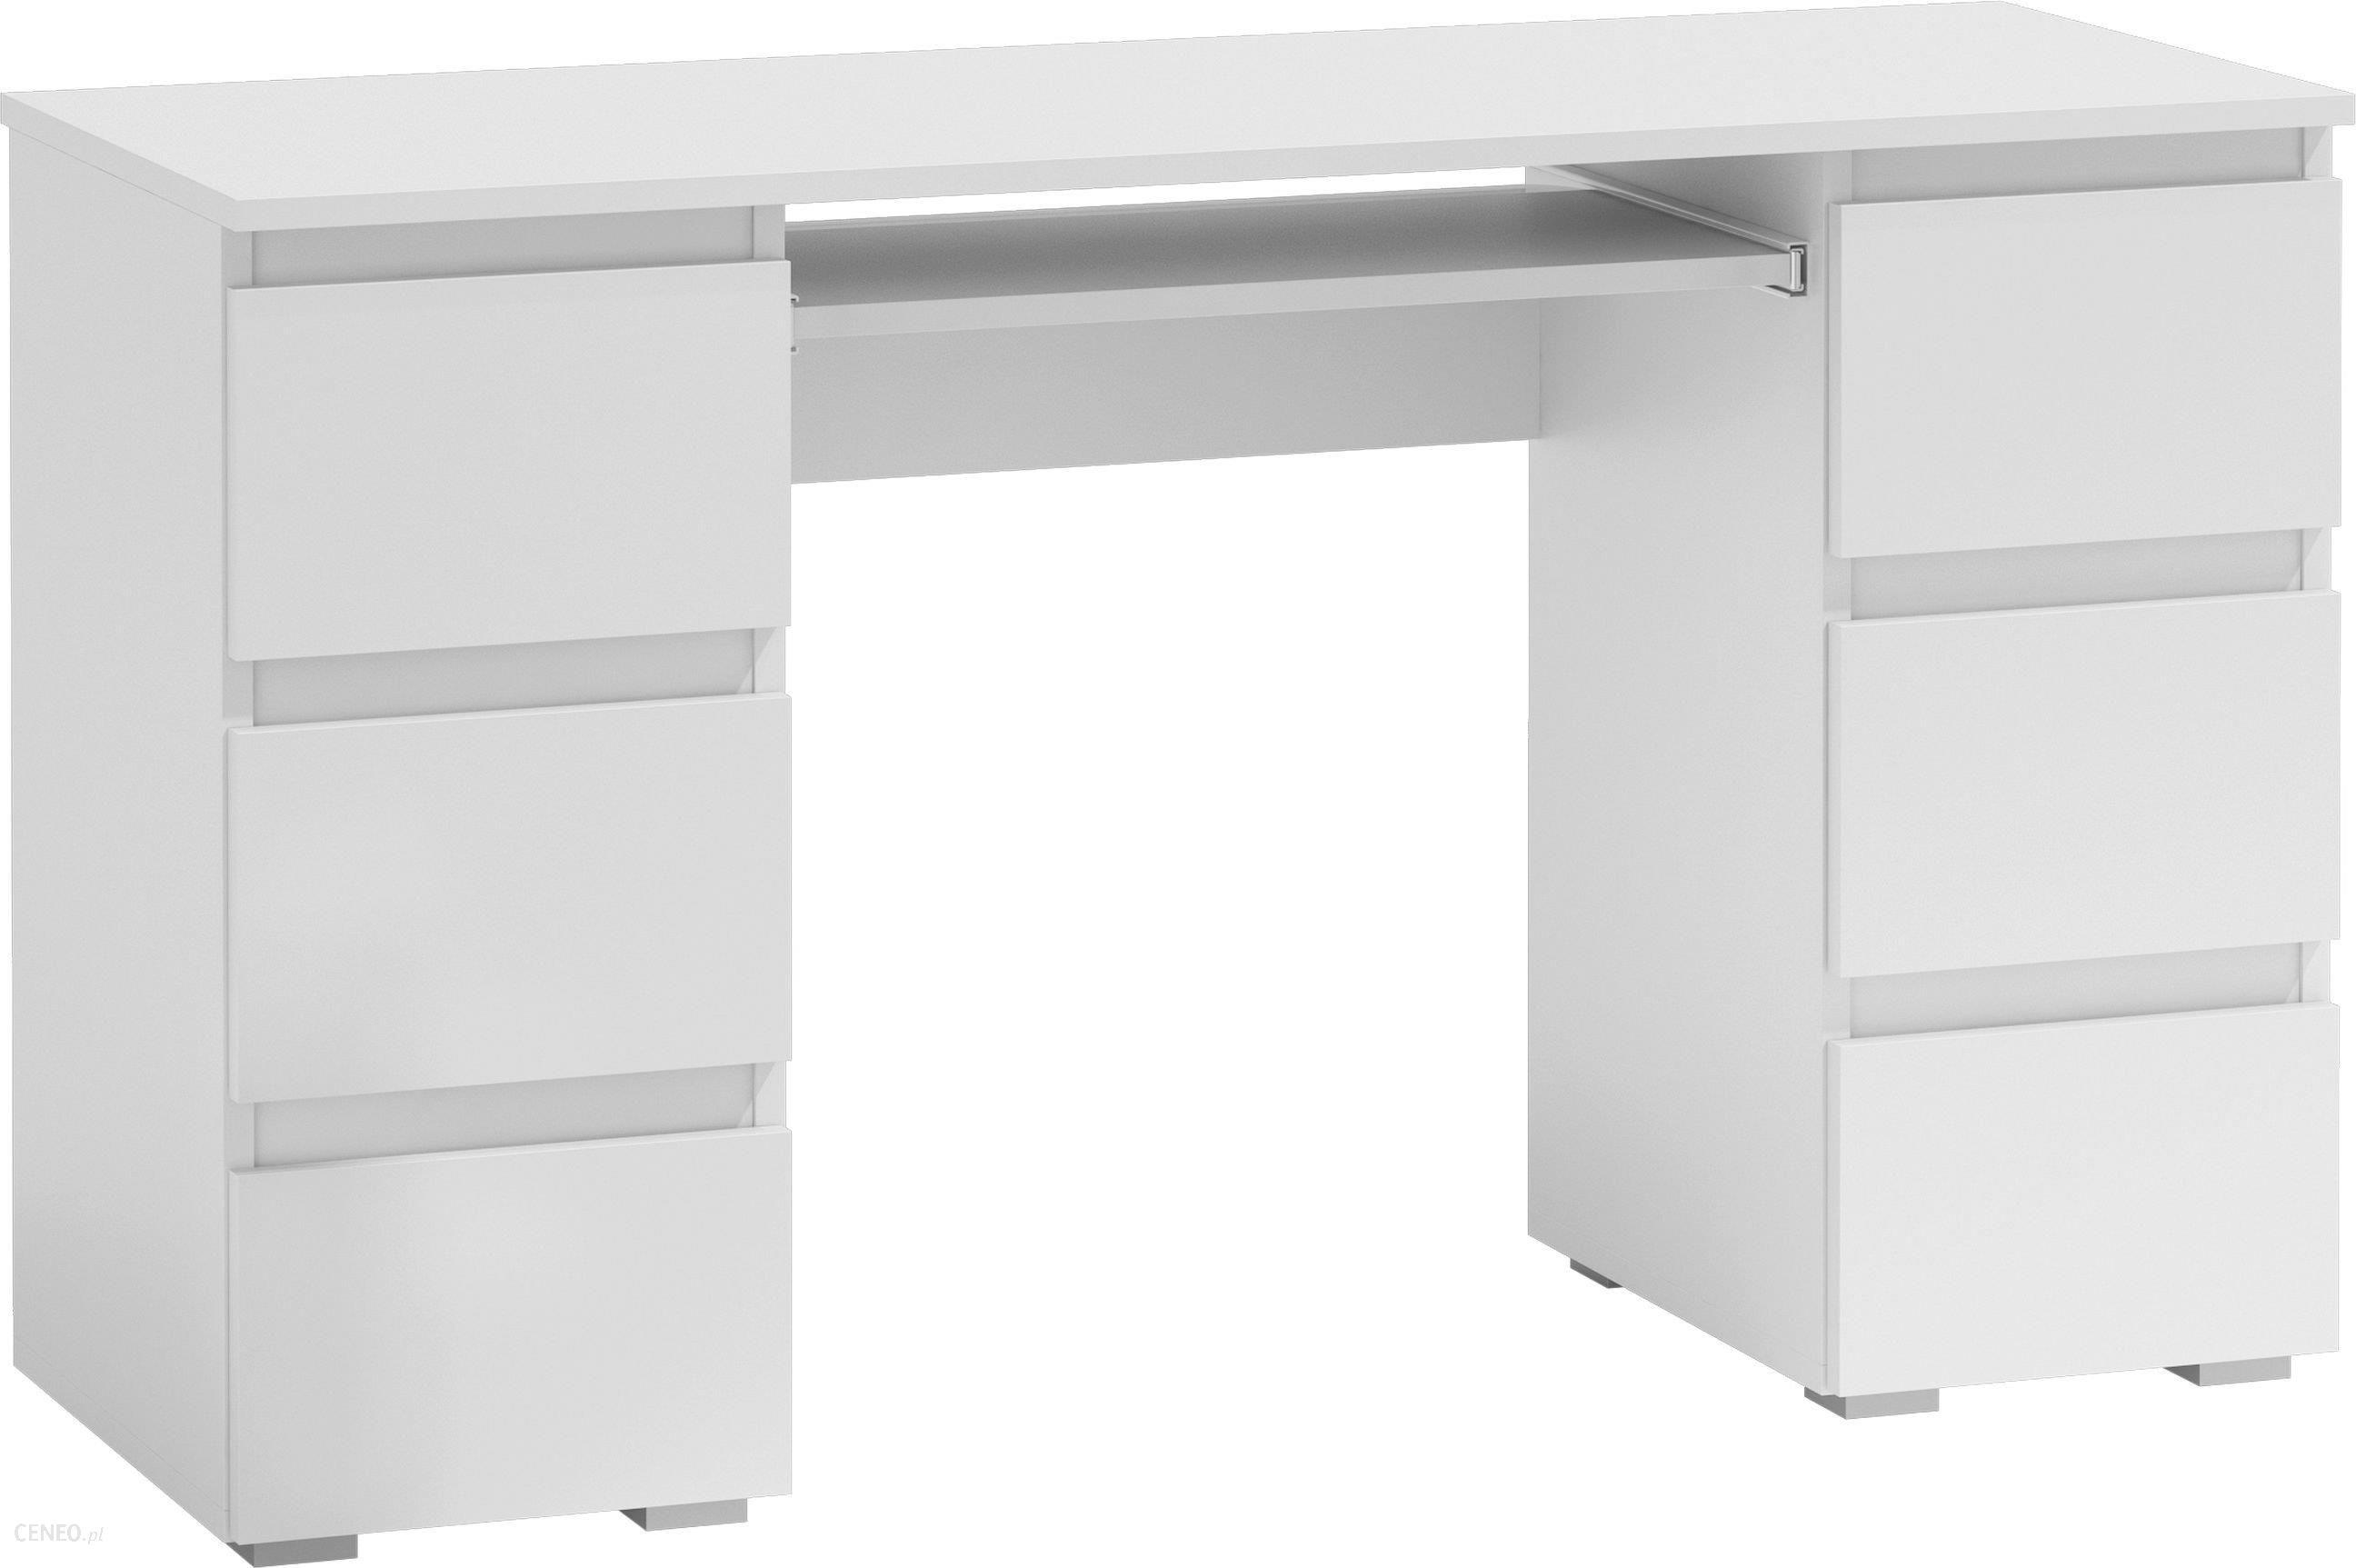 Biurko TopEshop Biurko komputerowe 6 szuflad na klik biel